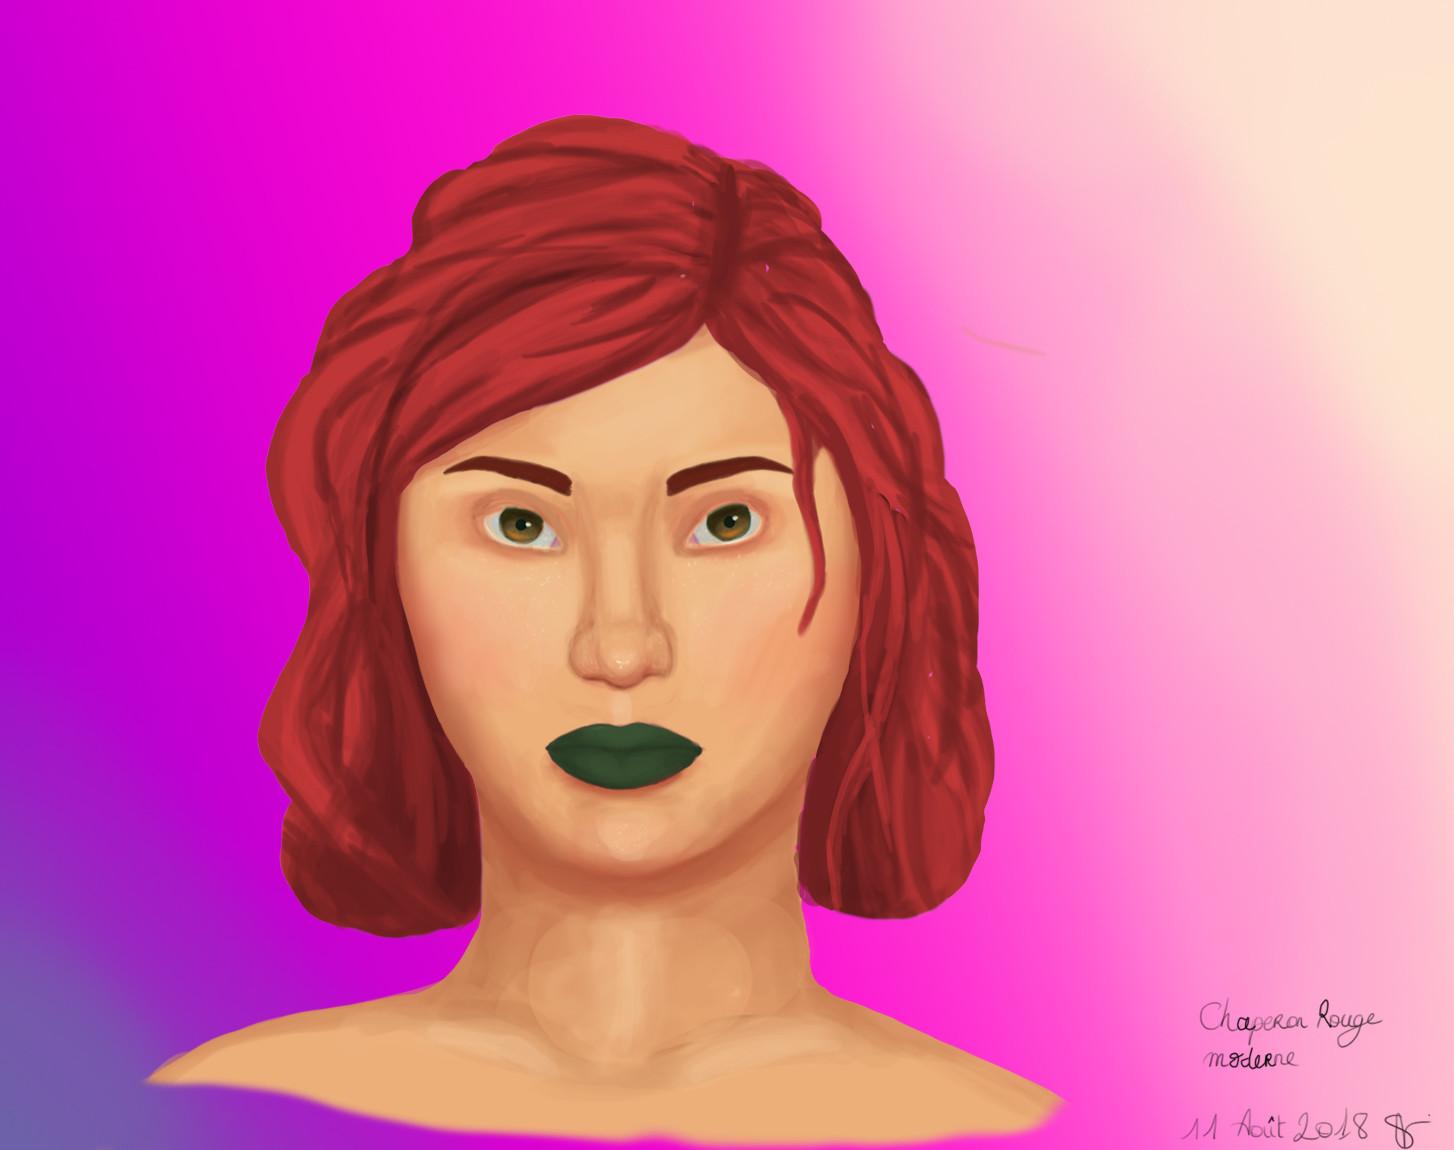 Aditi Sharma,Elsa Benitez MEX 1997-1999 Adult image Rina Nagasaki (b. 1987),Katherine Heigl born November 24, 1978 (age 39)